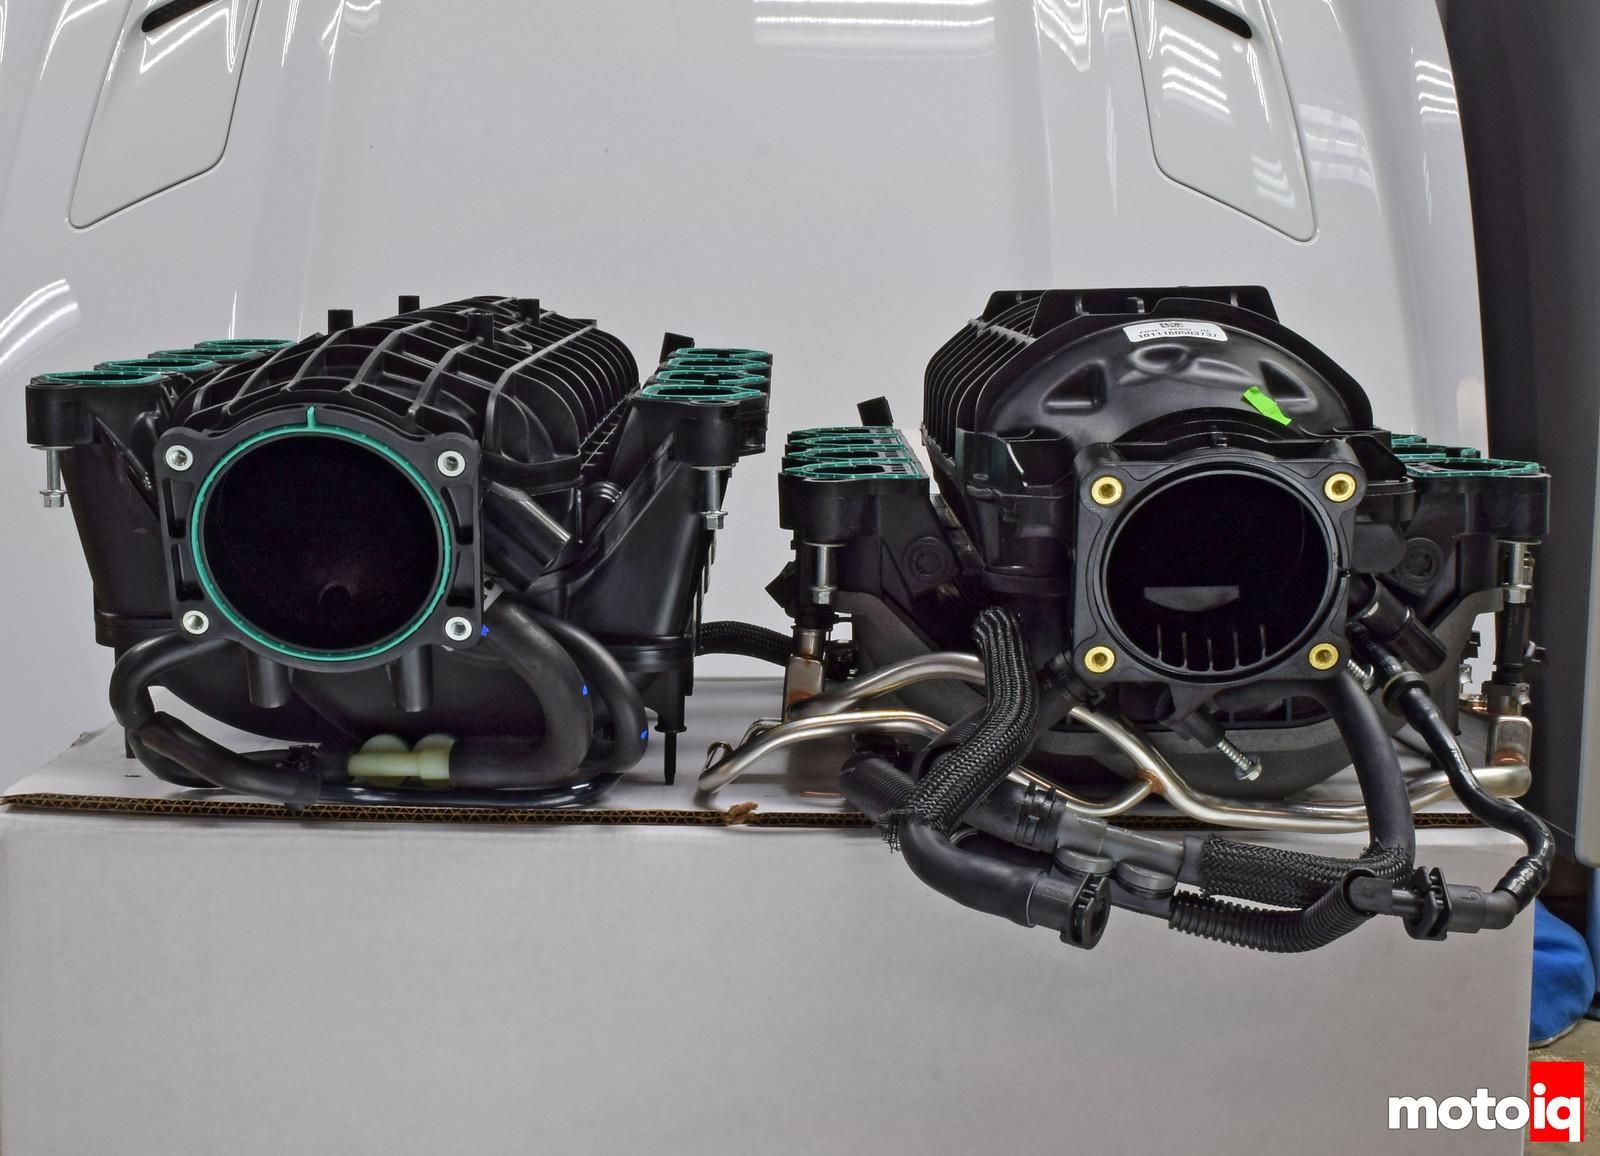 GT vs GT350 IM frontal upsidown